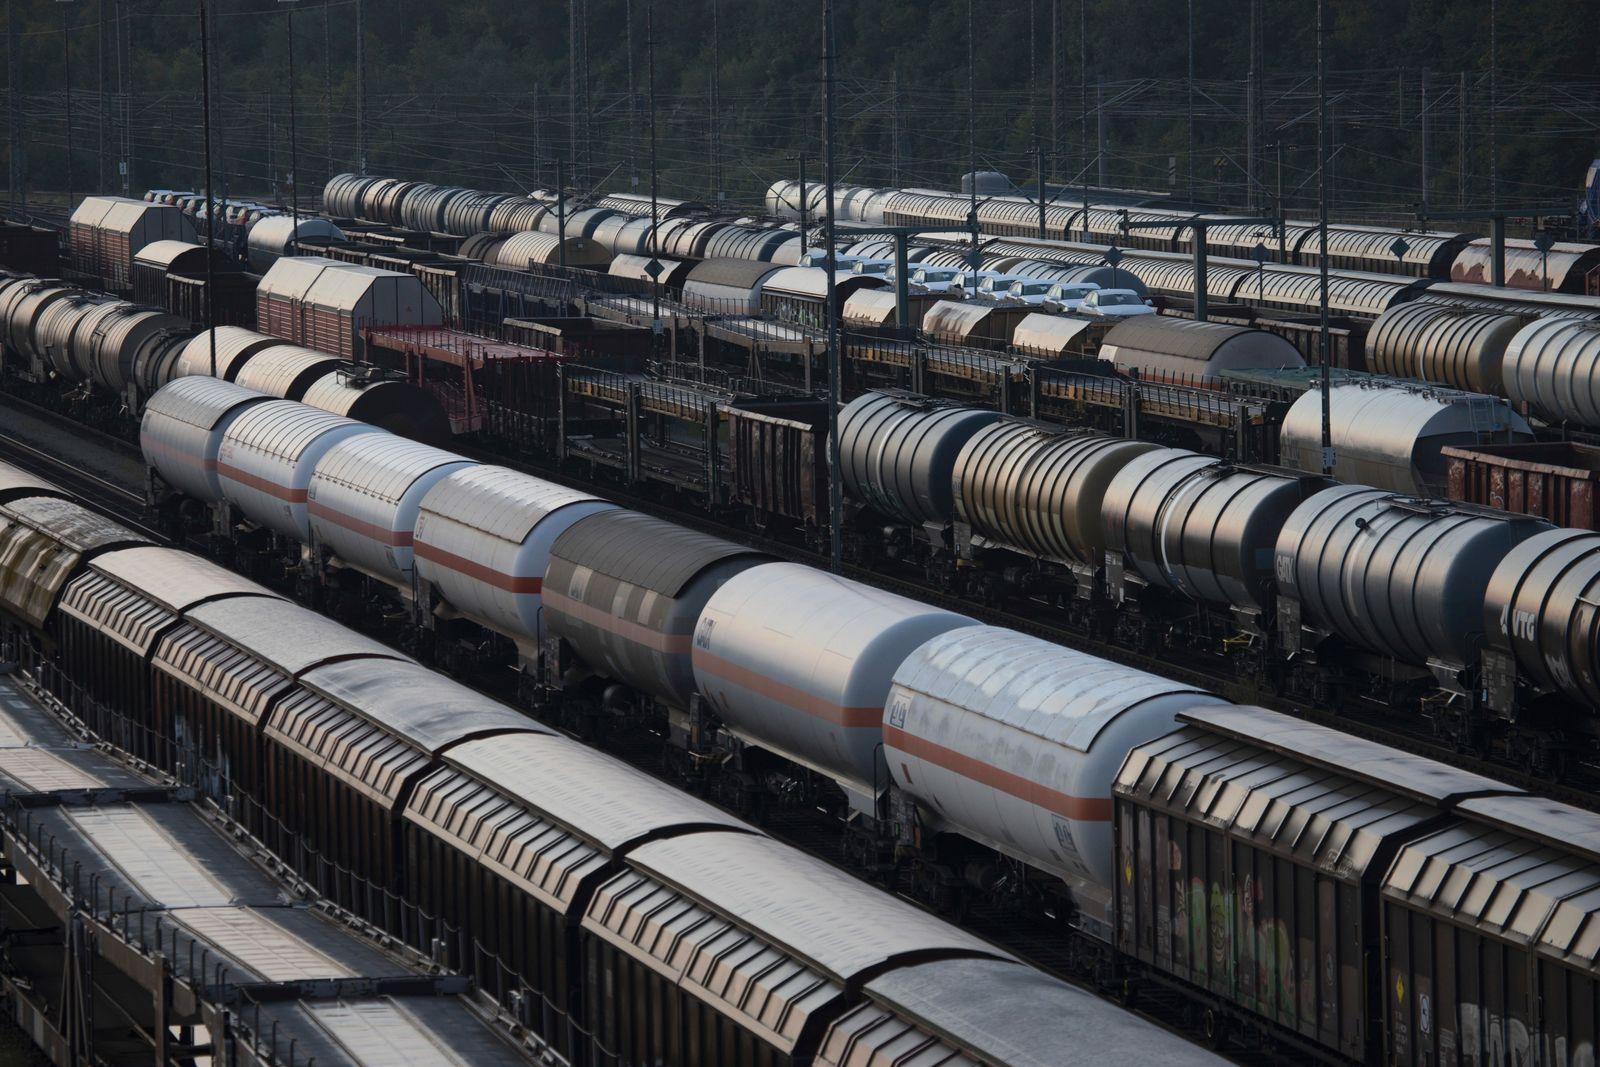 Freight Wagons In A Railway Stockyard